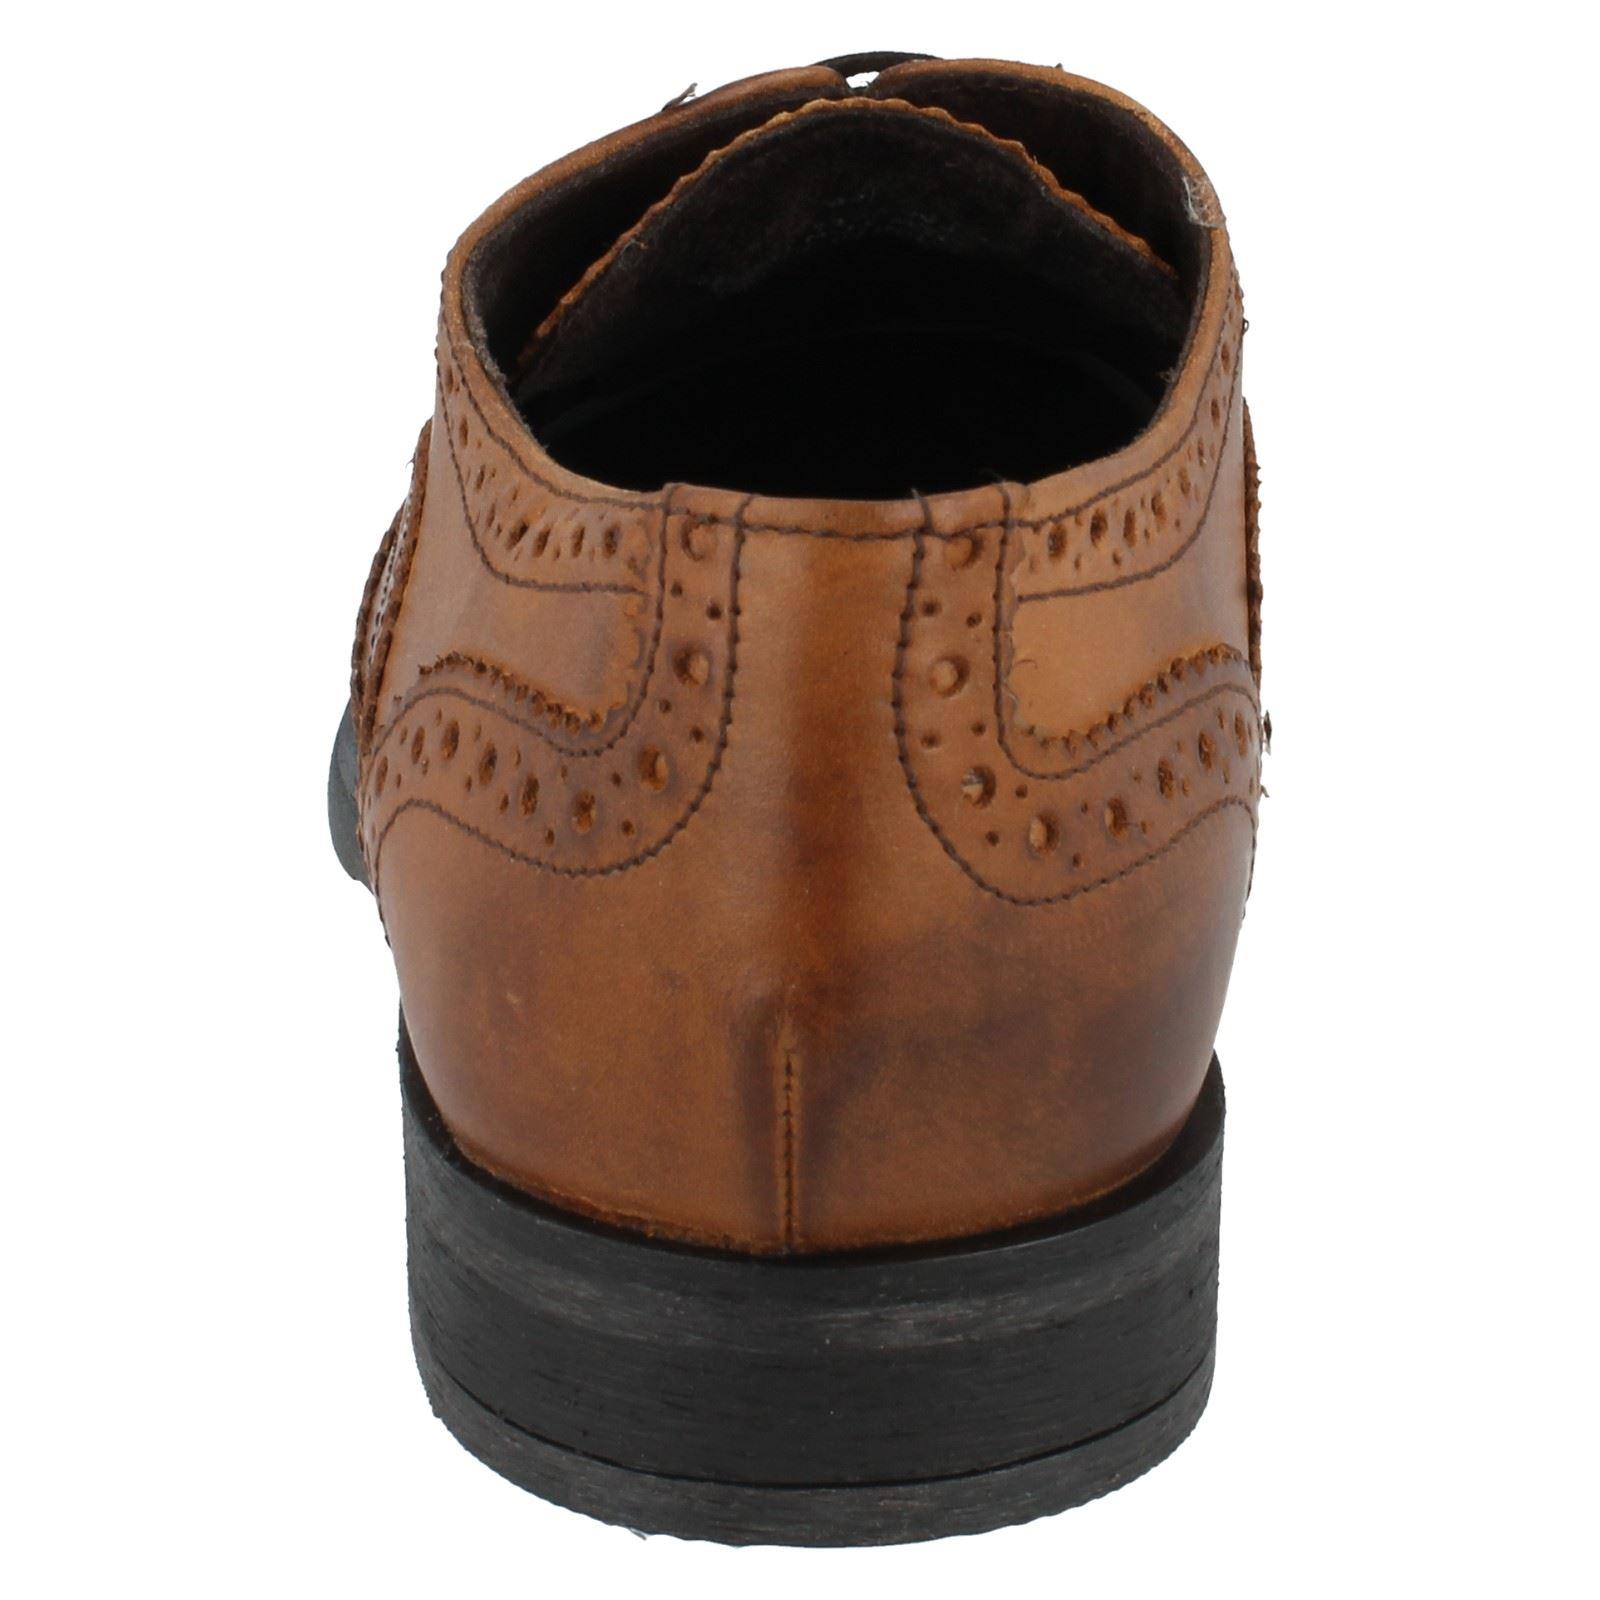 Schuhes  Herren Base London Formal Brogue Smart Schuhes  Walnut MTO 3f026d